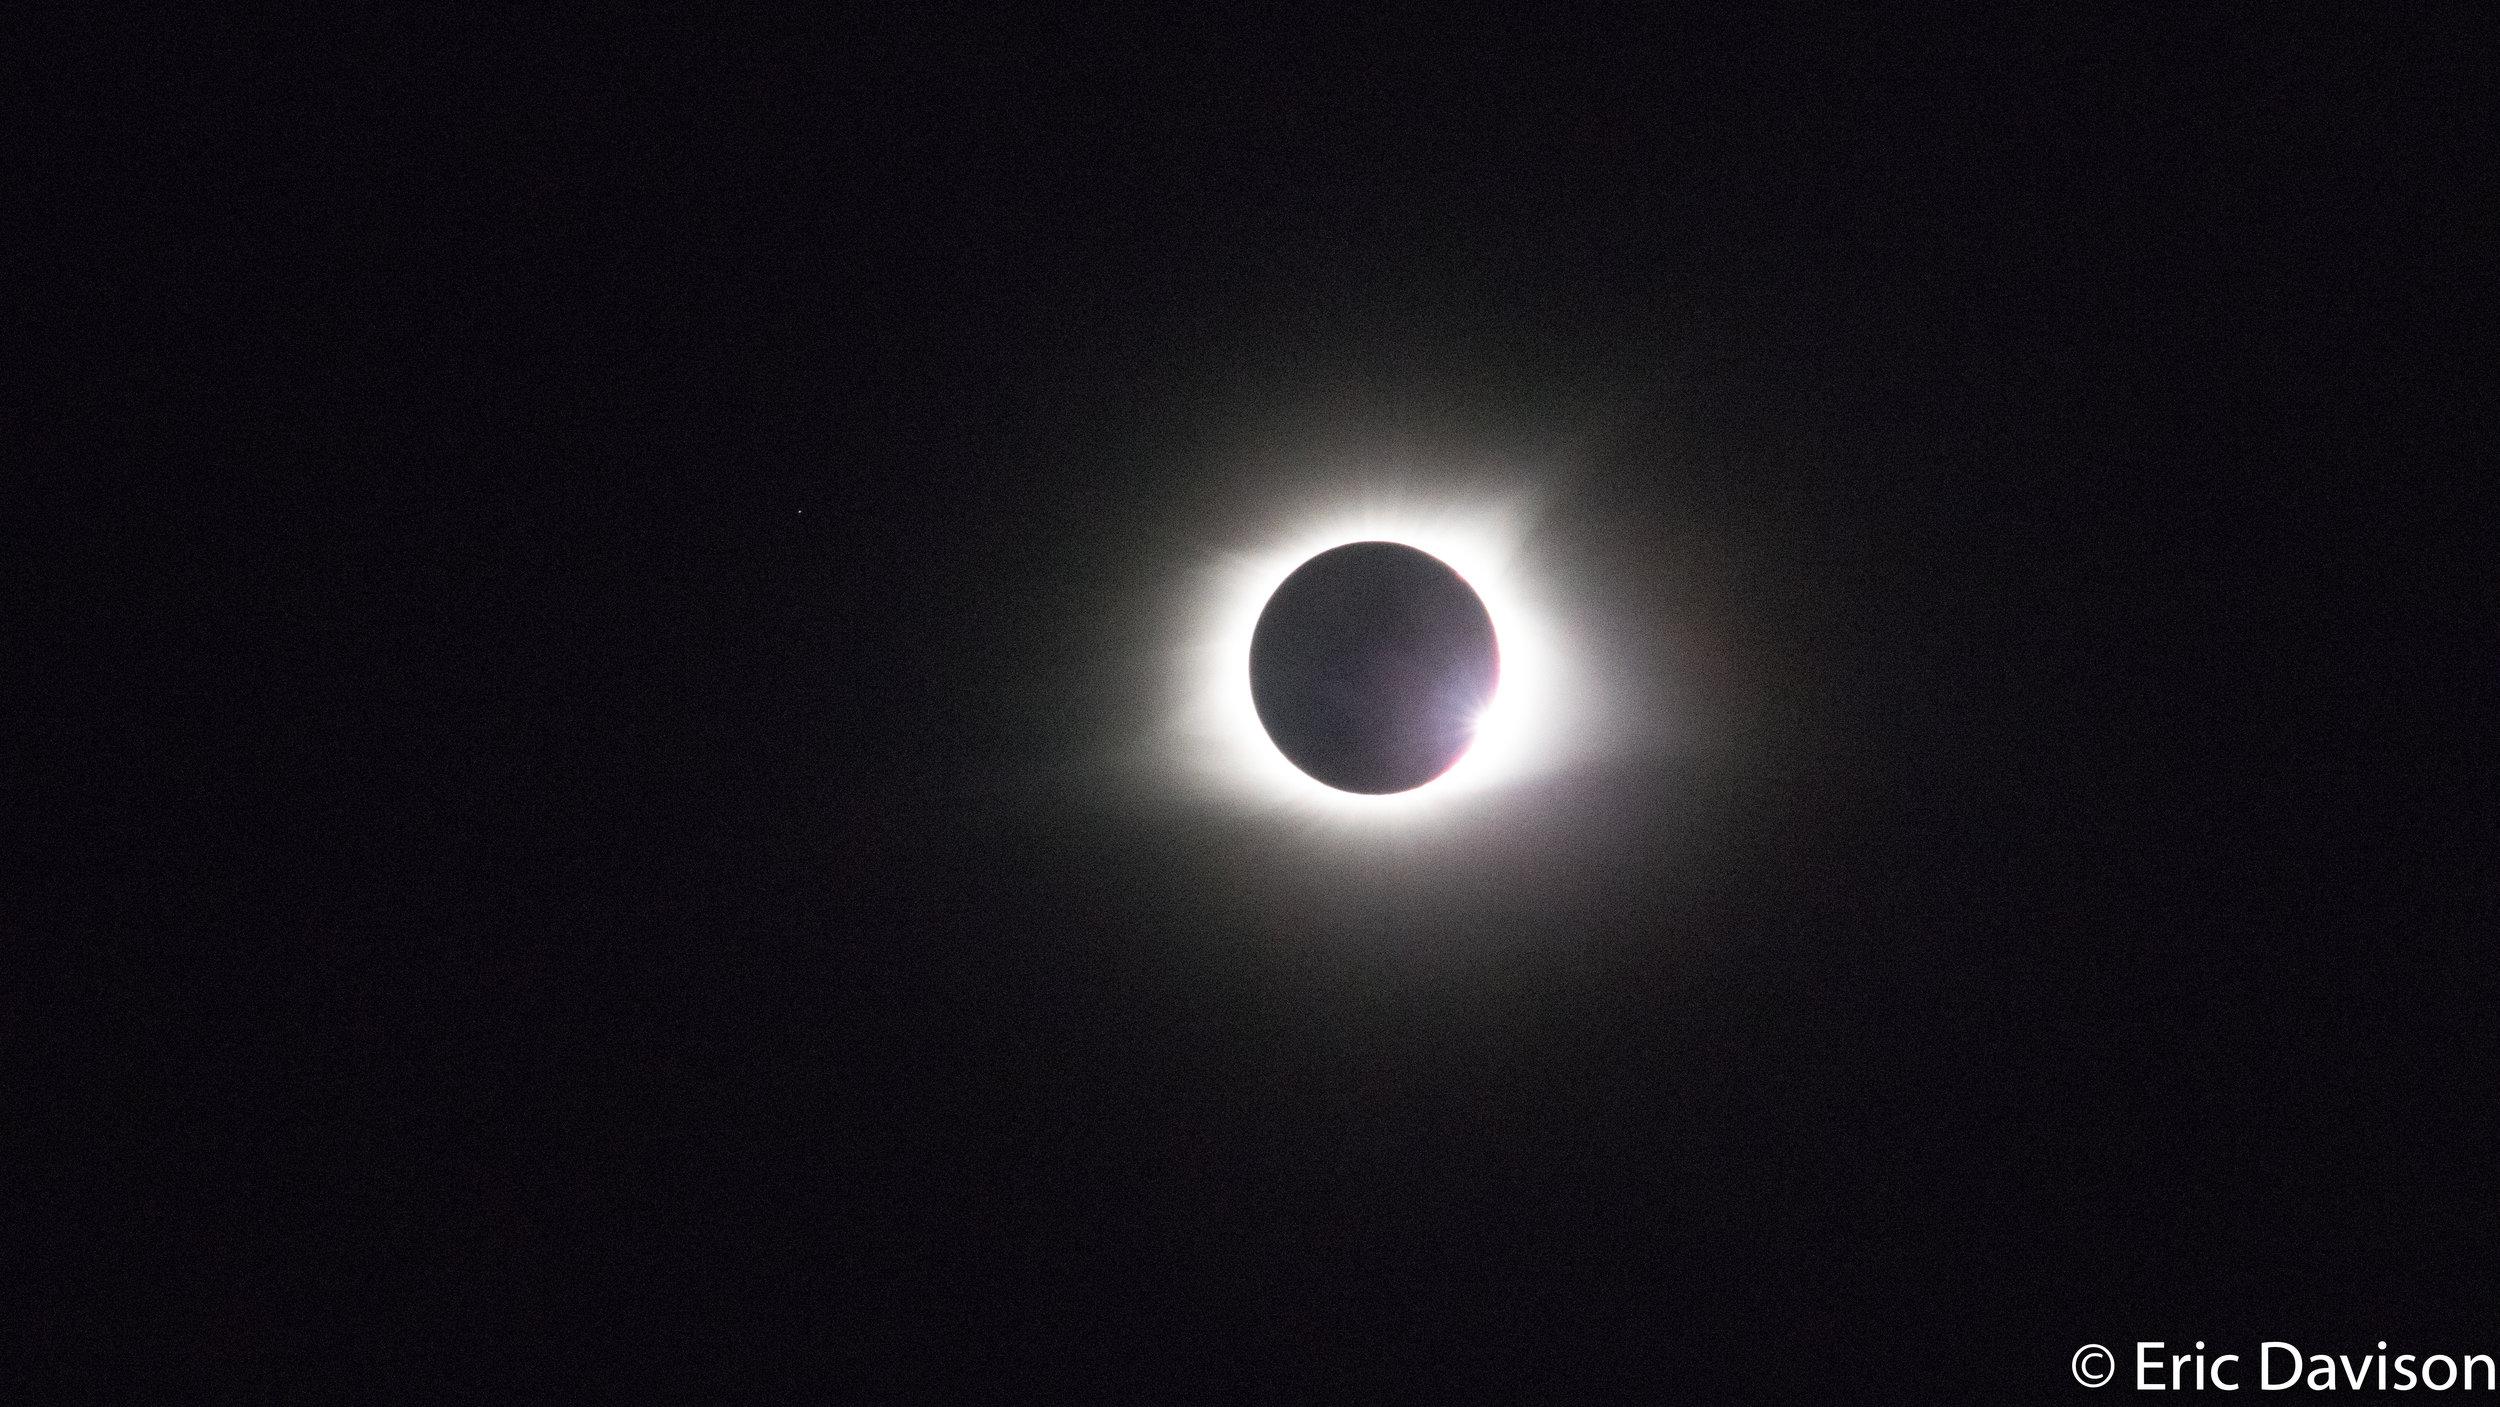 A Tiny Sun - 2017 Total Solar Eclipse Nashville, TN